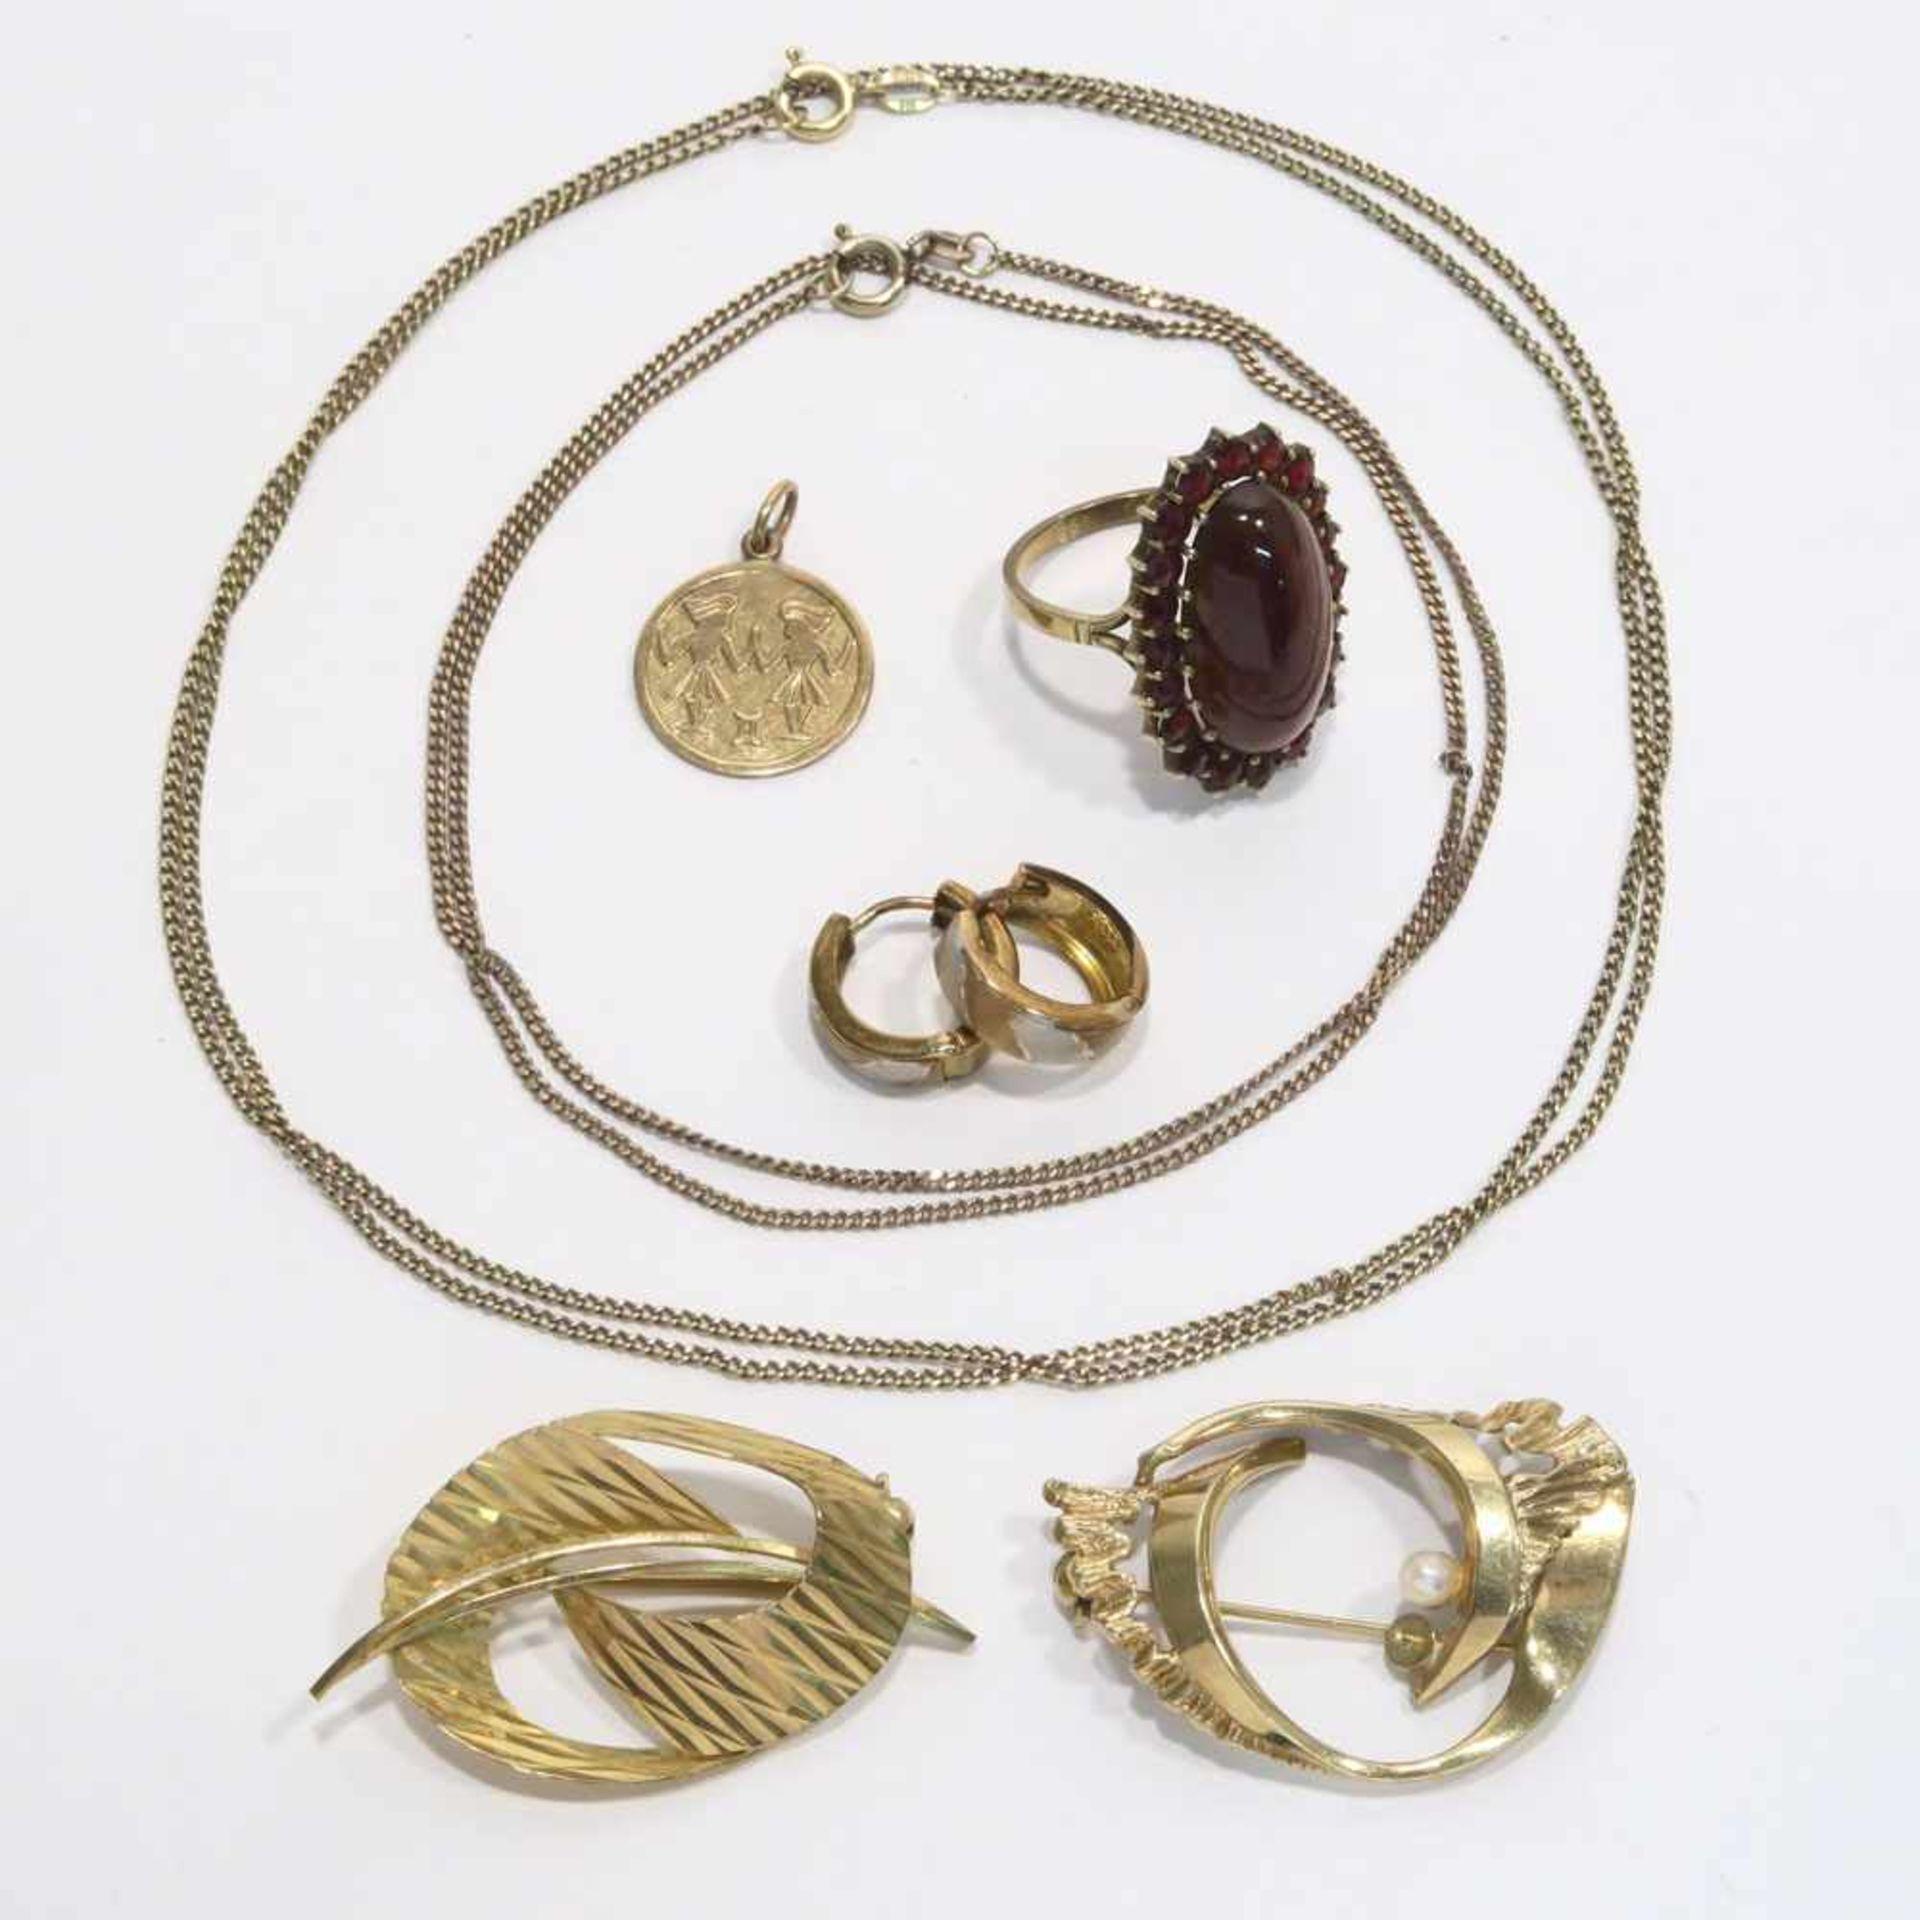 Los 51 - Konvolut Goldschmuck, 7tlg.8 K GG/RG/WG, Marken (333). Perle bzw. Granaten, tlw. Gravur. Versch.